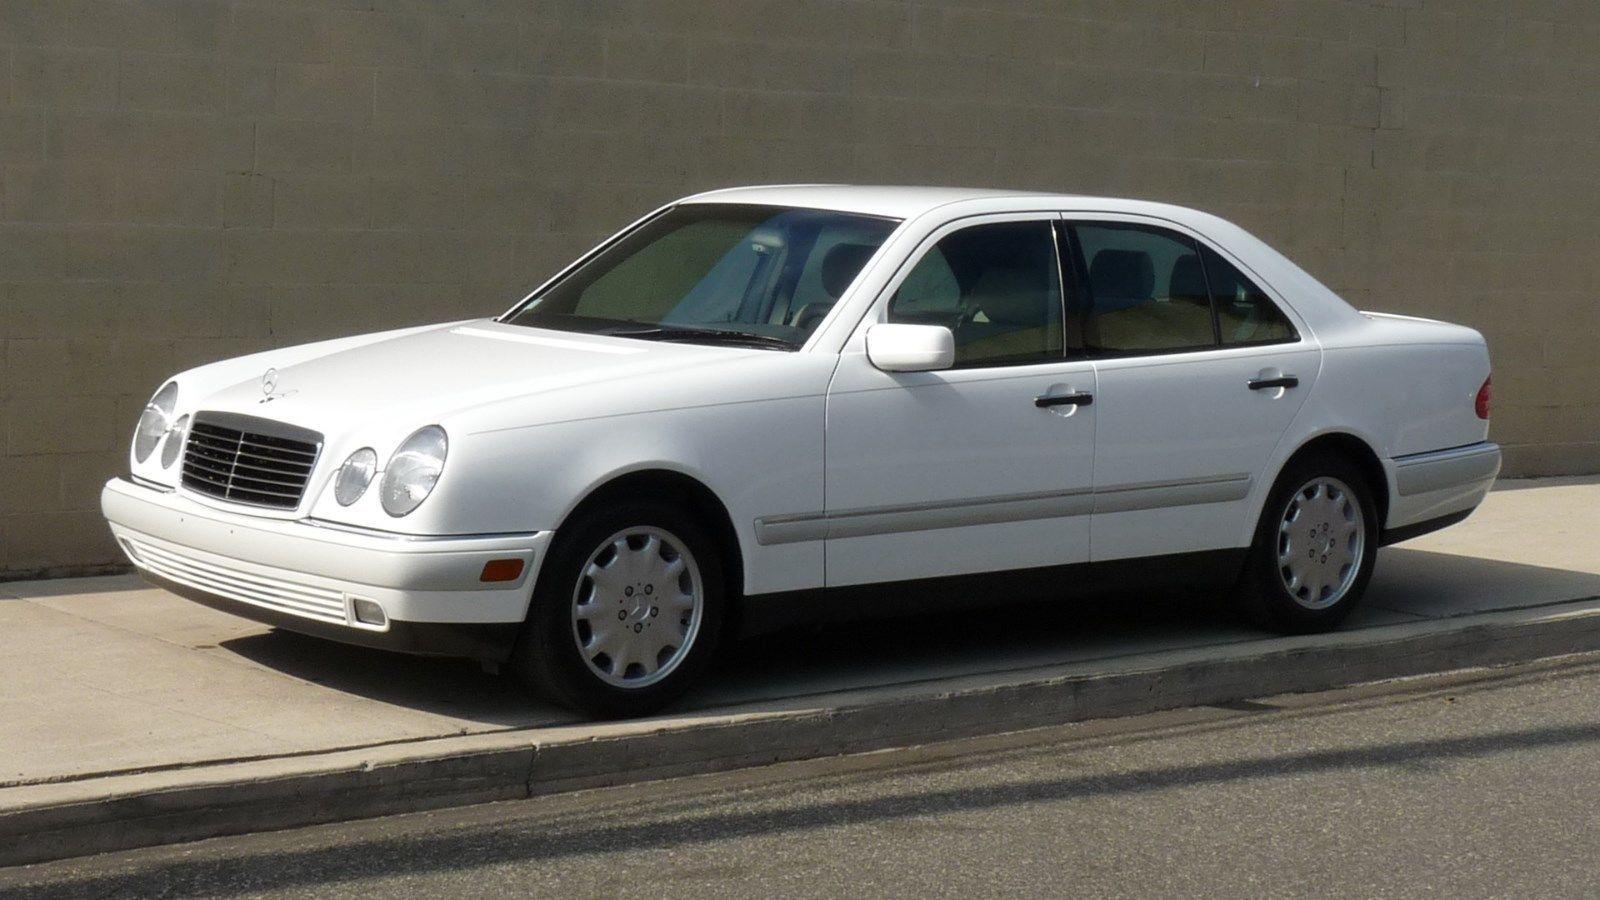 1997 mercedes benz e class e320 1997 mercedes e320 46 693 miles 1 owner absolutely gorgeous e420 e500 [ 1600 x 900 Pixel ]